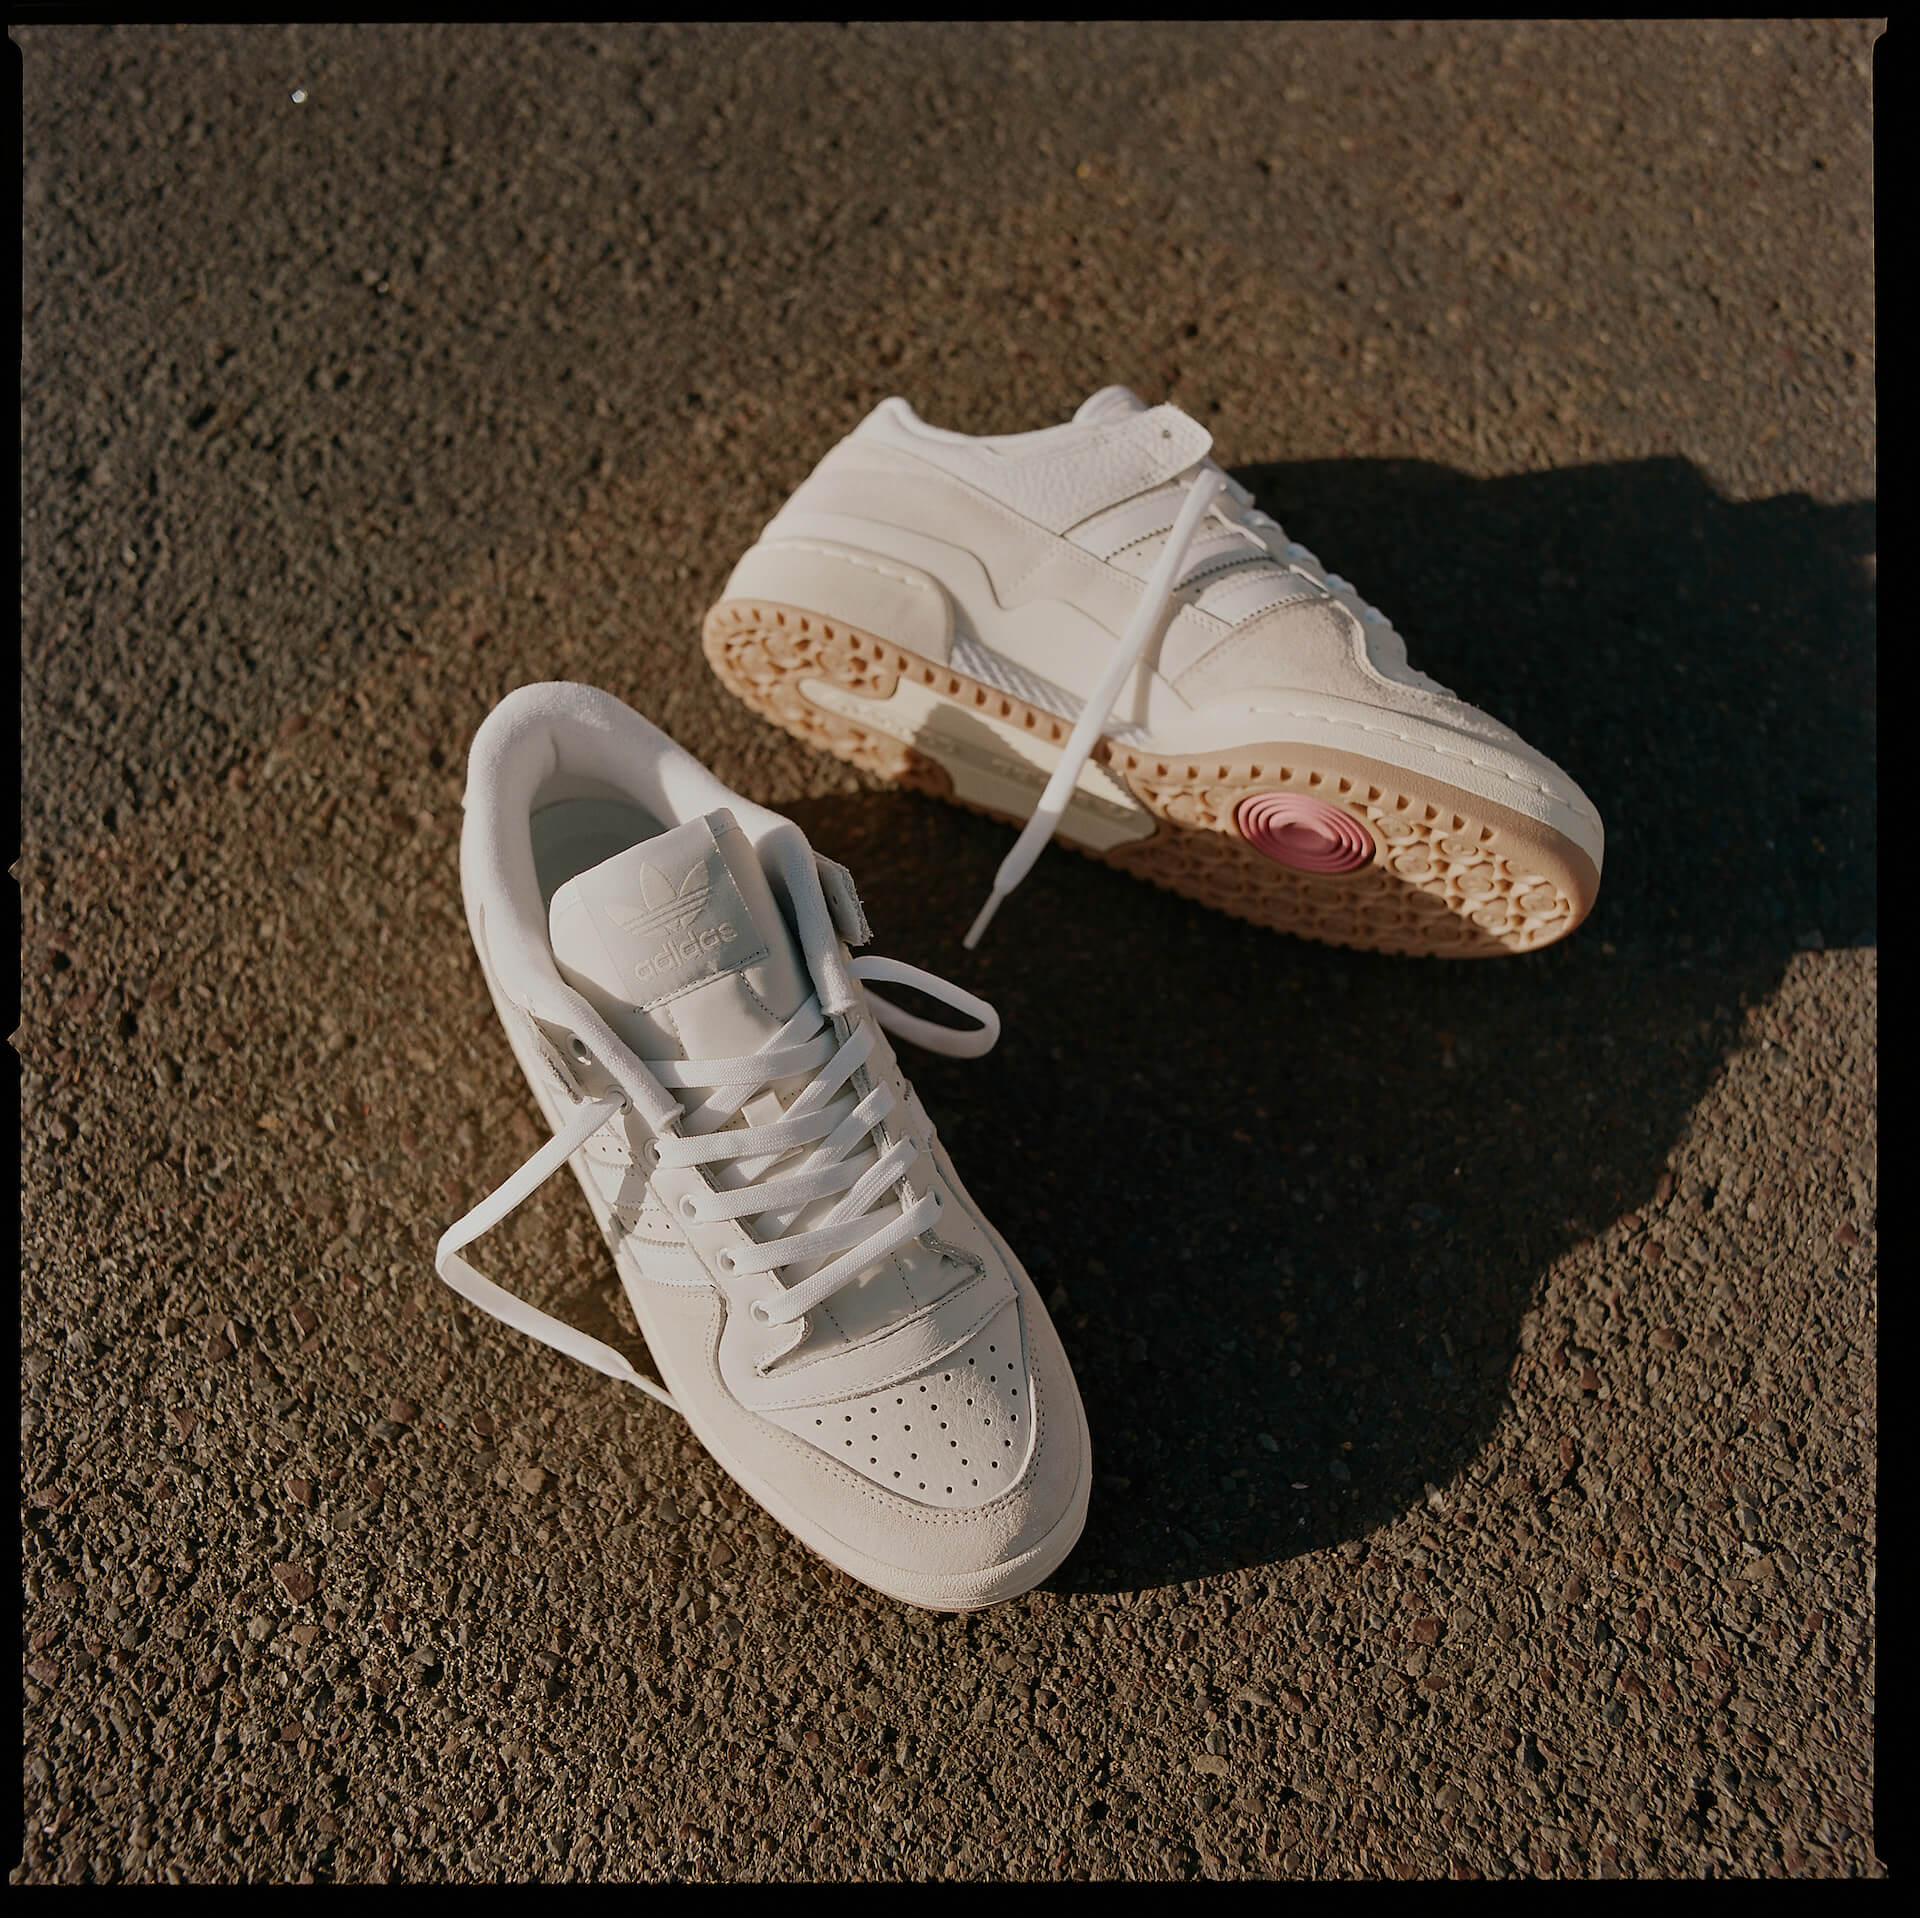 adidas Skateboarding「FORUM 84 ADV」に春夏仕様の新色が登場!チョークホワイト&ブラックの2色 life210324_adidasskateboarding_4